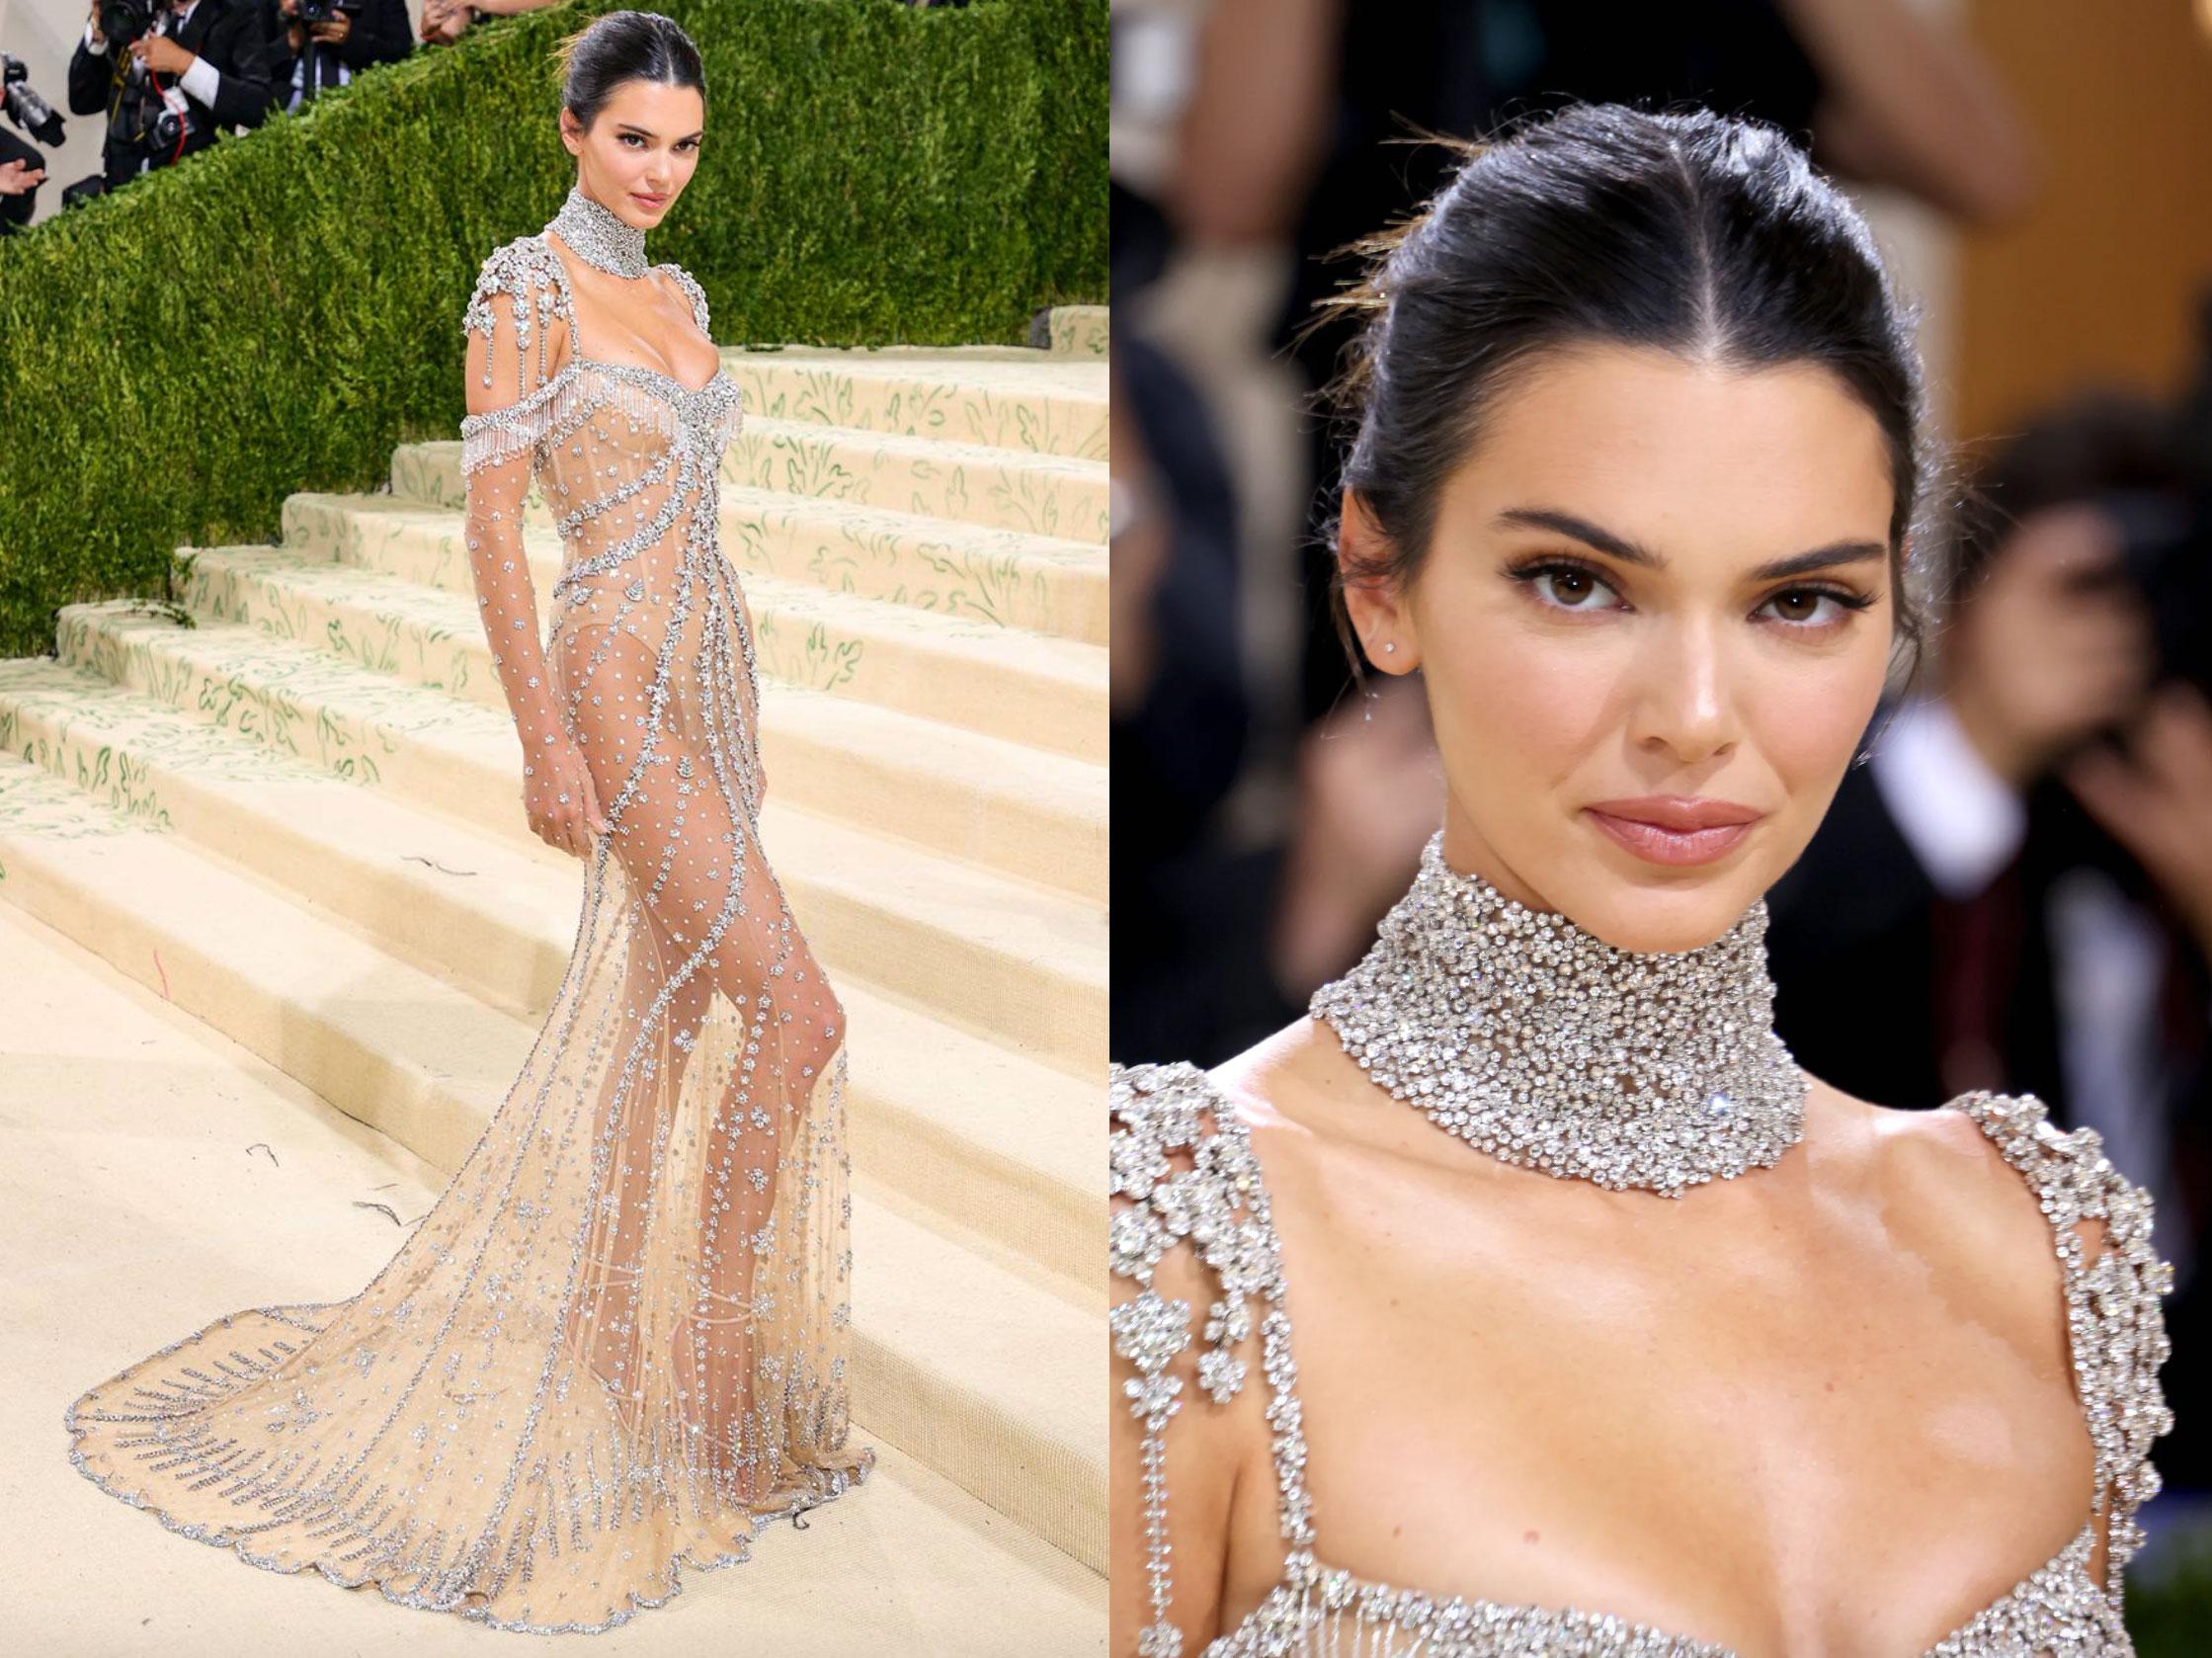 Kendall Jenner jewellery